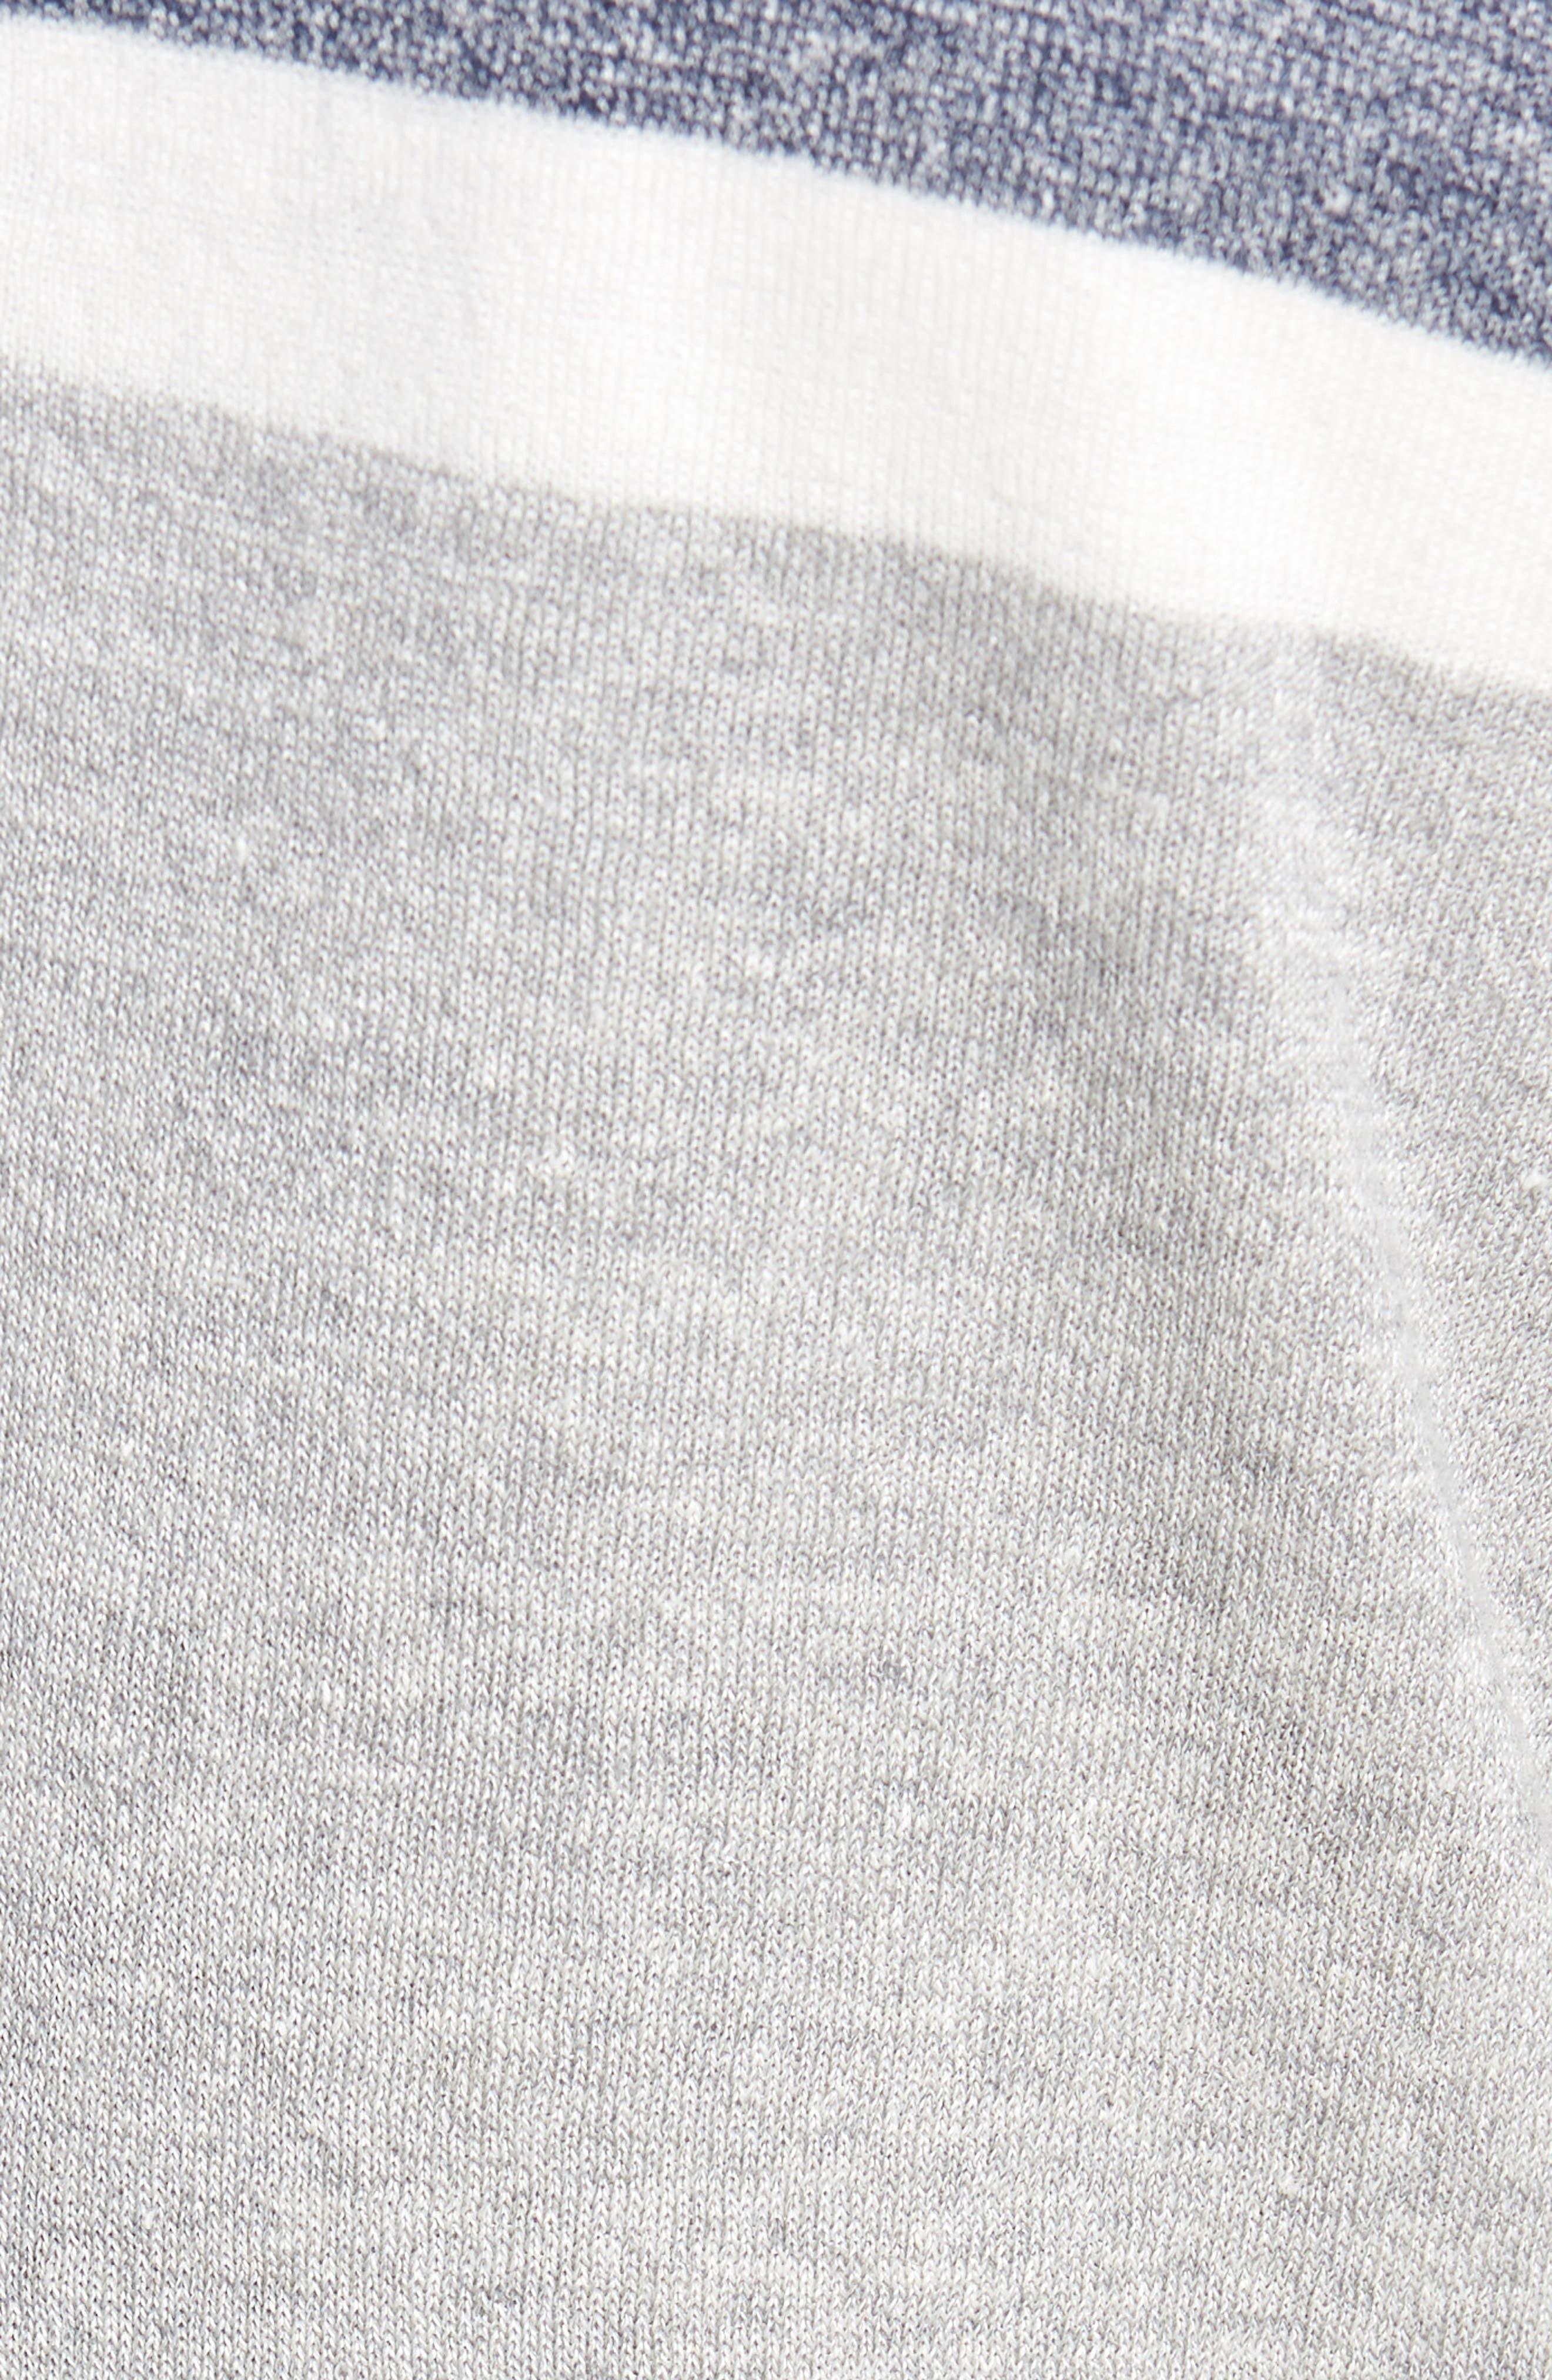 Colorblock Sweater Jacket,                             Alternate thumbnail 5, color,                             Grey